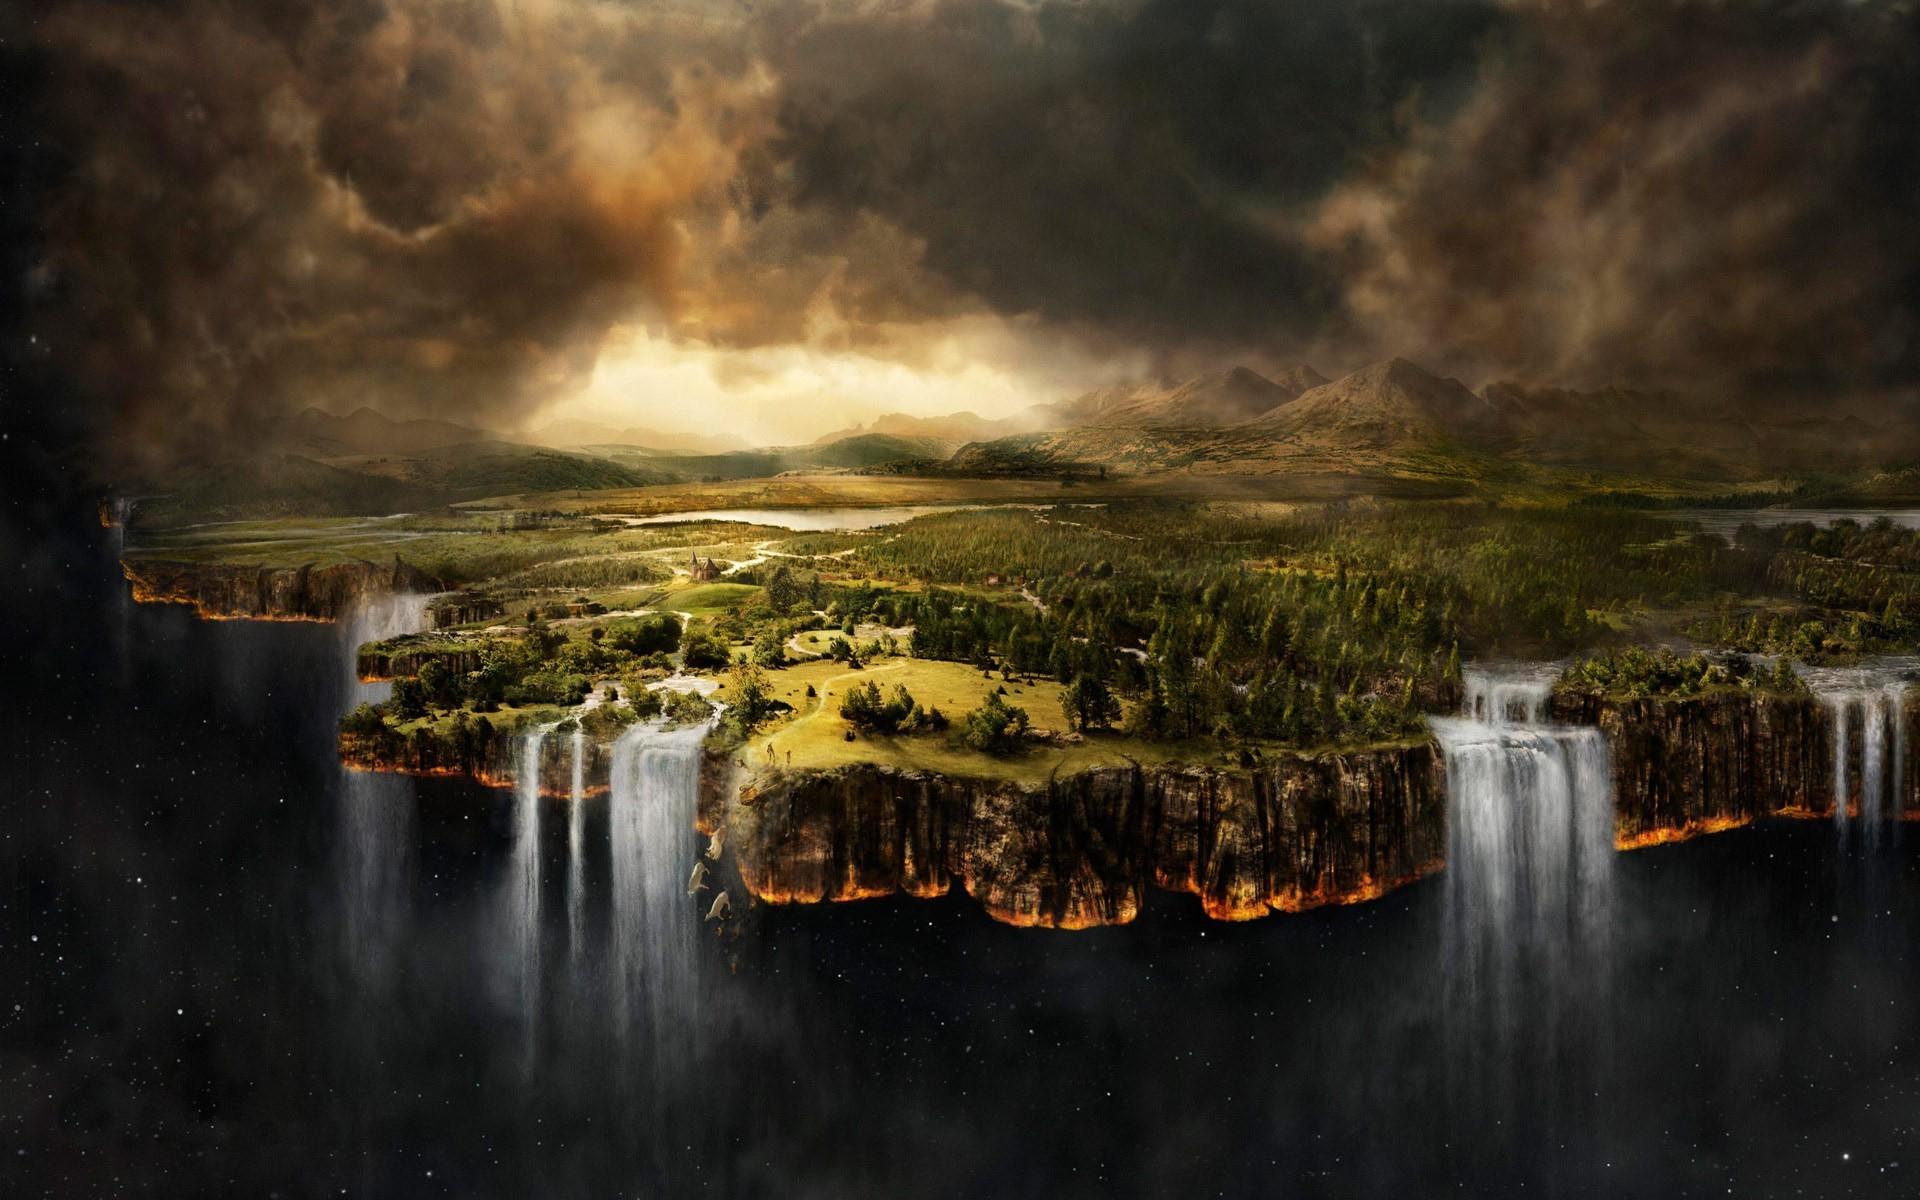 Falling Water Wallpaper Fantasy Art Space Landscape Wallpapers Hd Desktop And